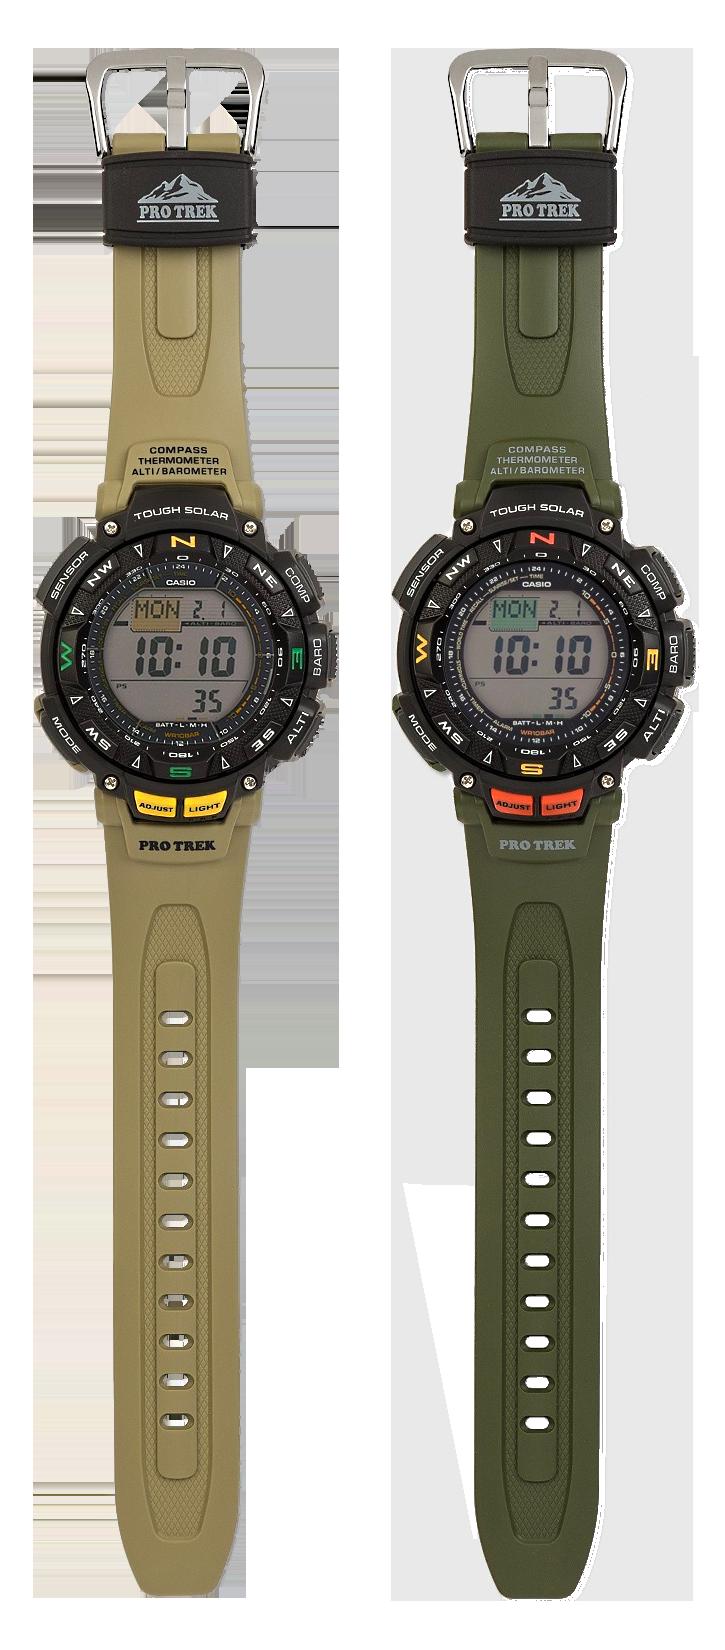 PRG-240-3 y PRG-240-5 vista completa relojes Casio Pro Trek2021